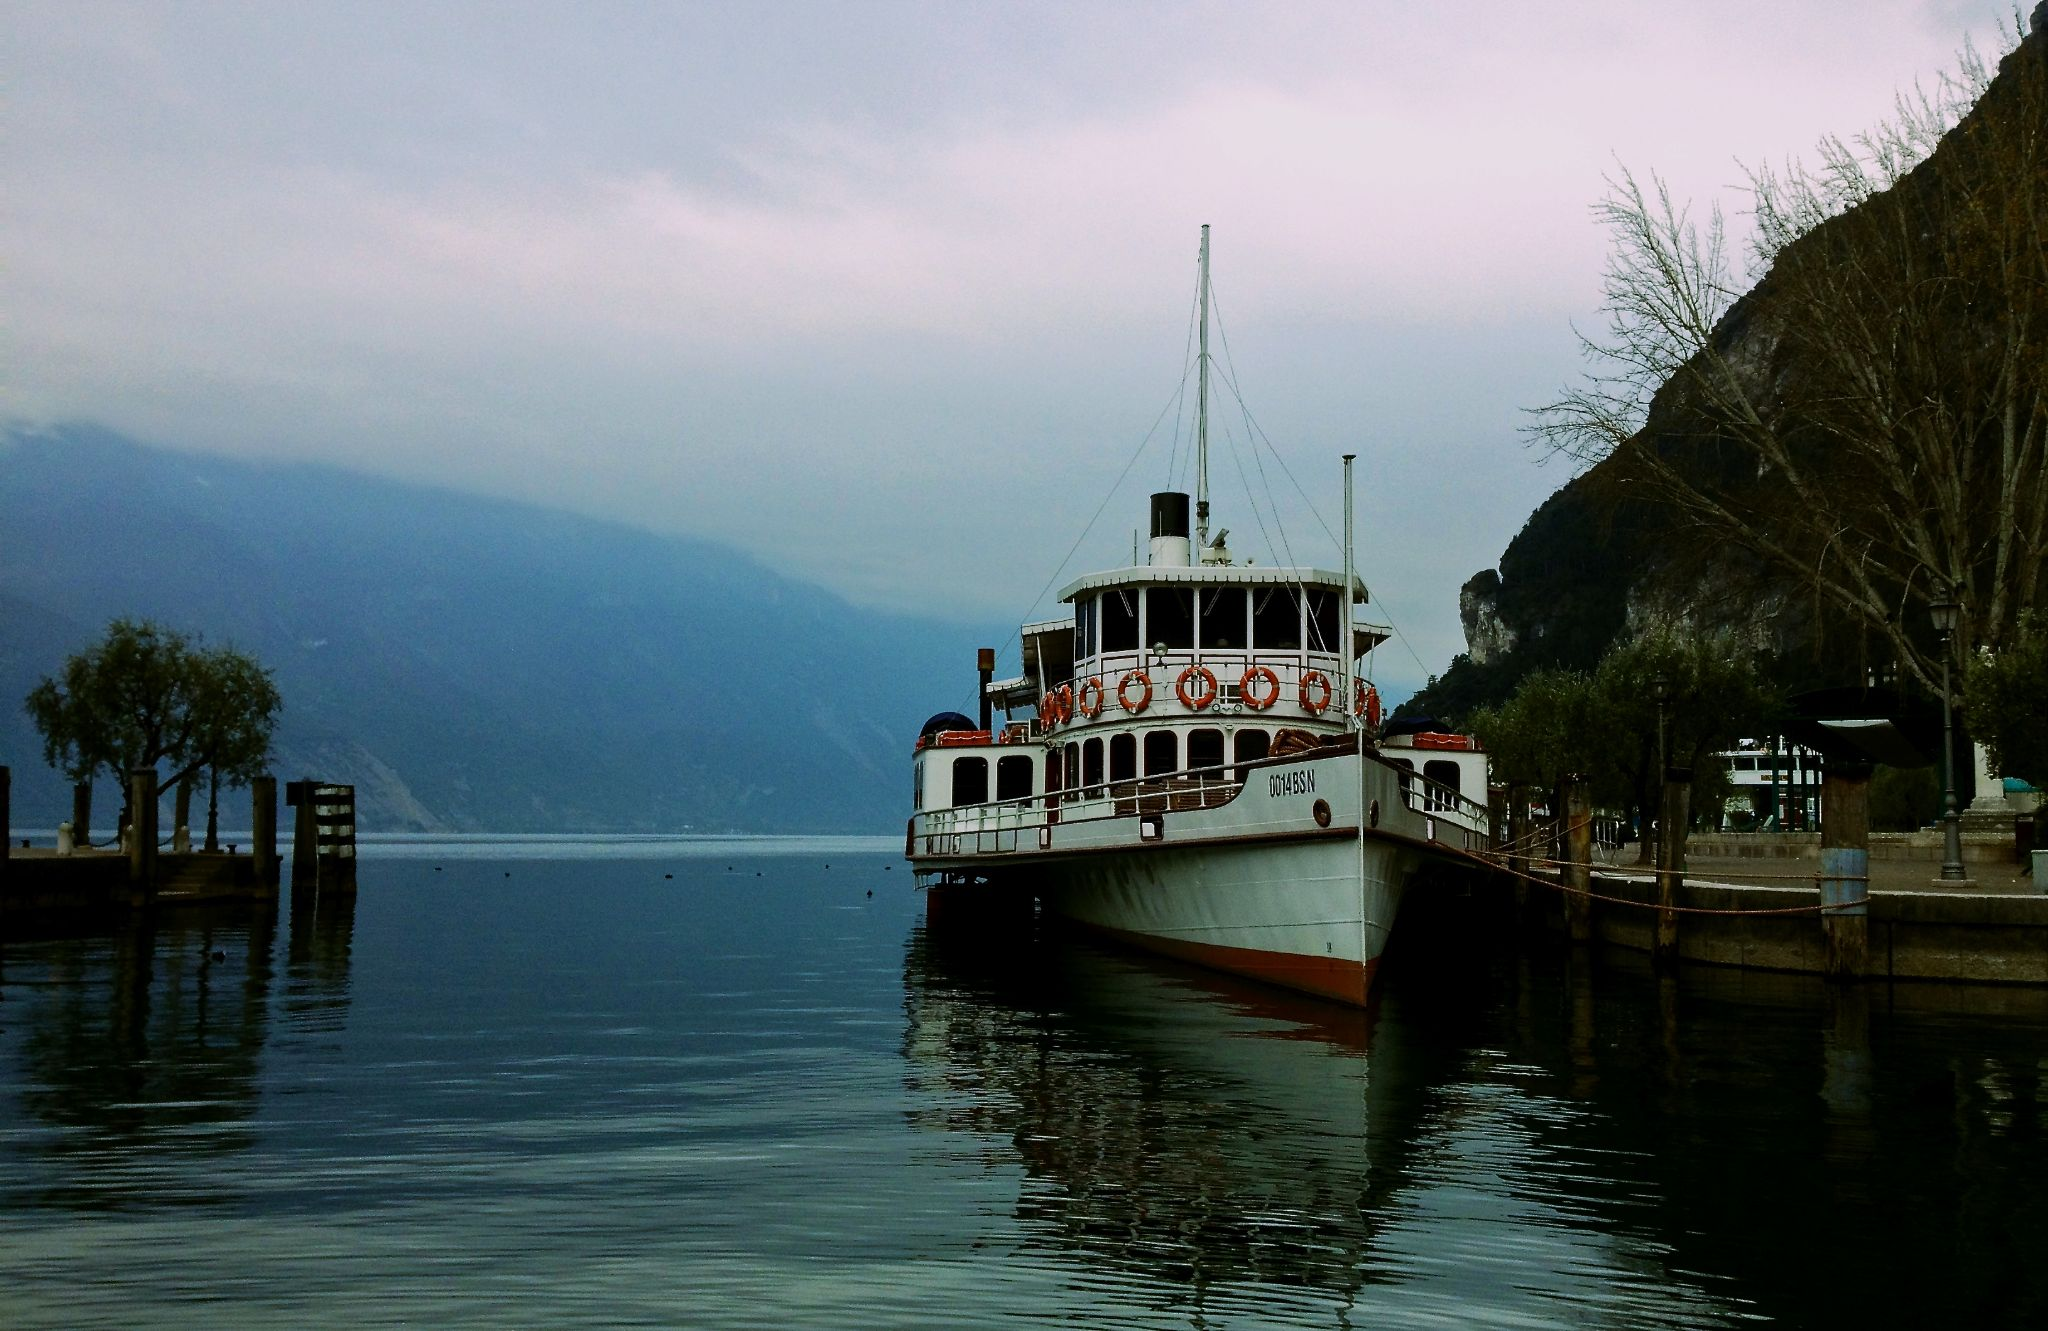 A ferry in Riva del Garda by SolidMac